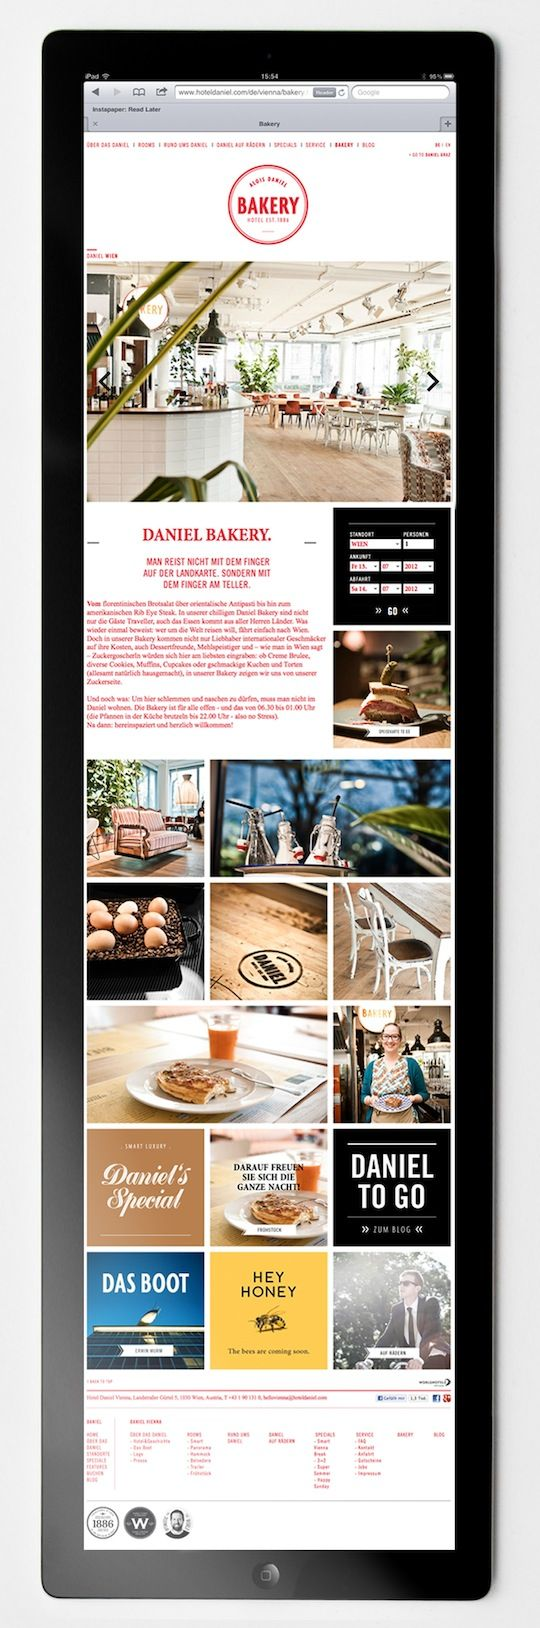 moodley brand identity -hotel daniel